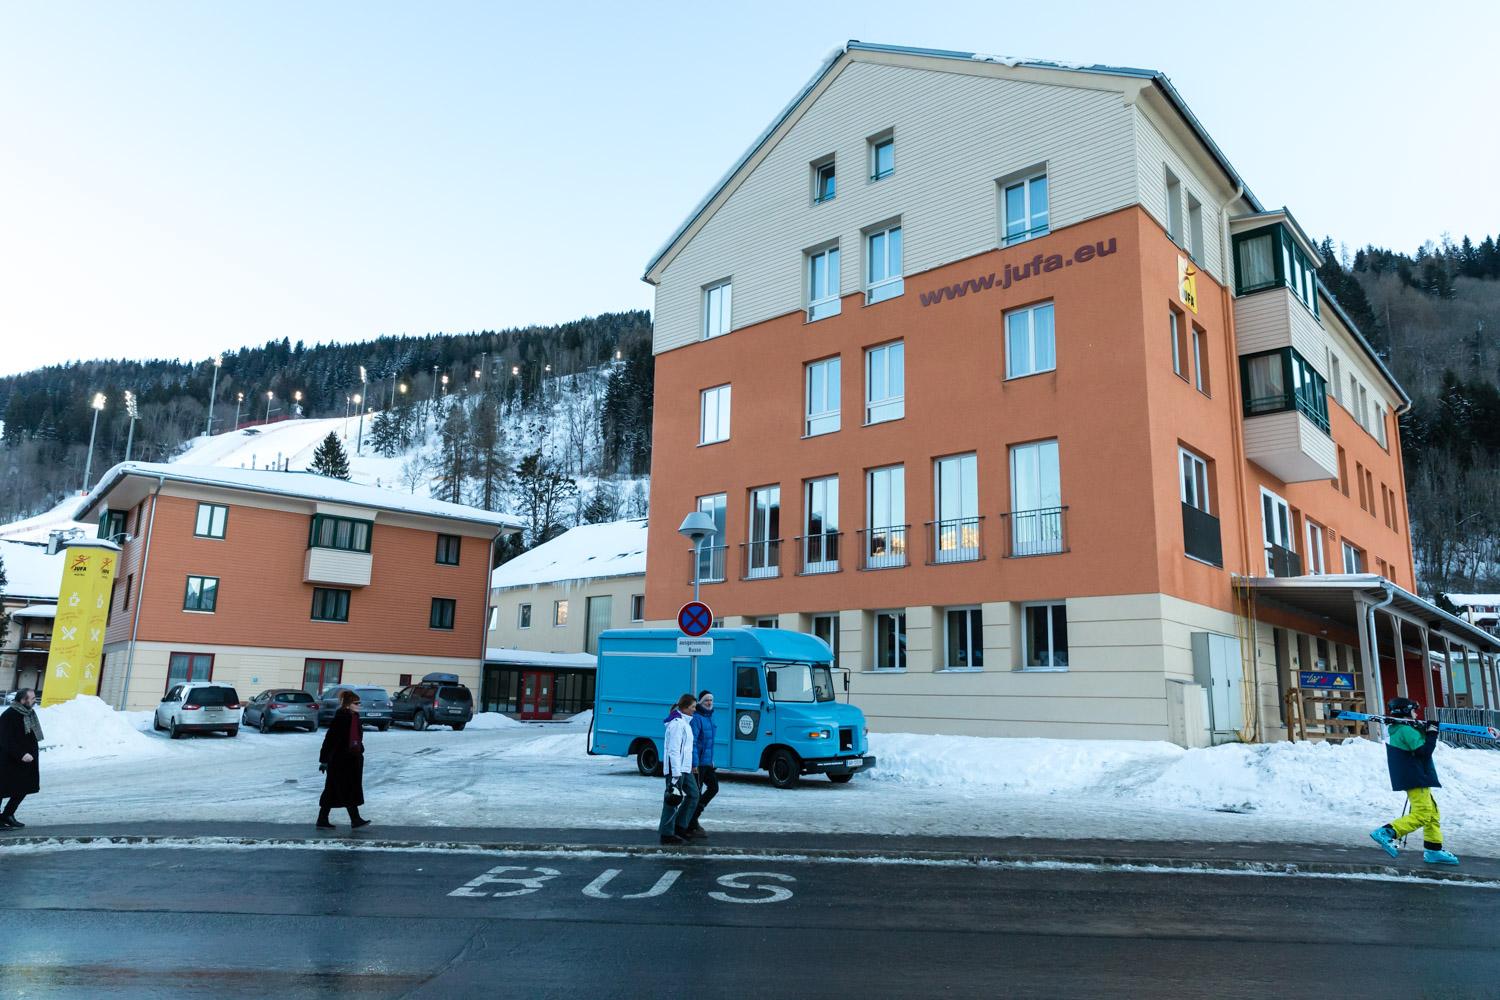 Schladming Hotel JUFA Hotel Schladming